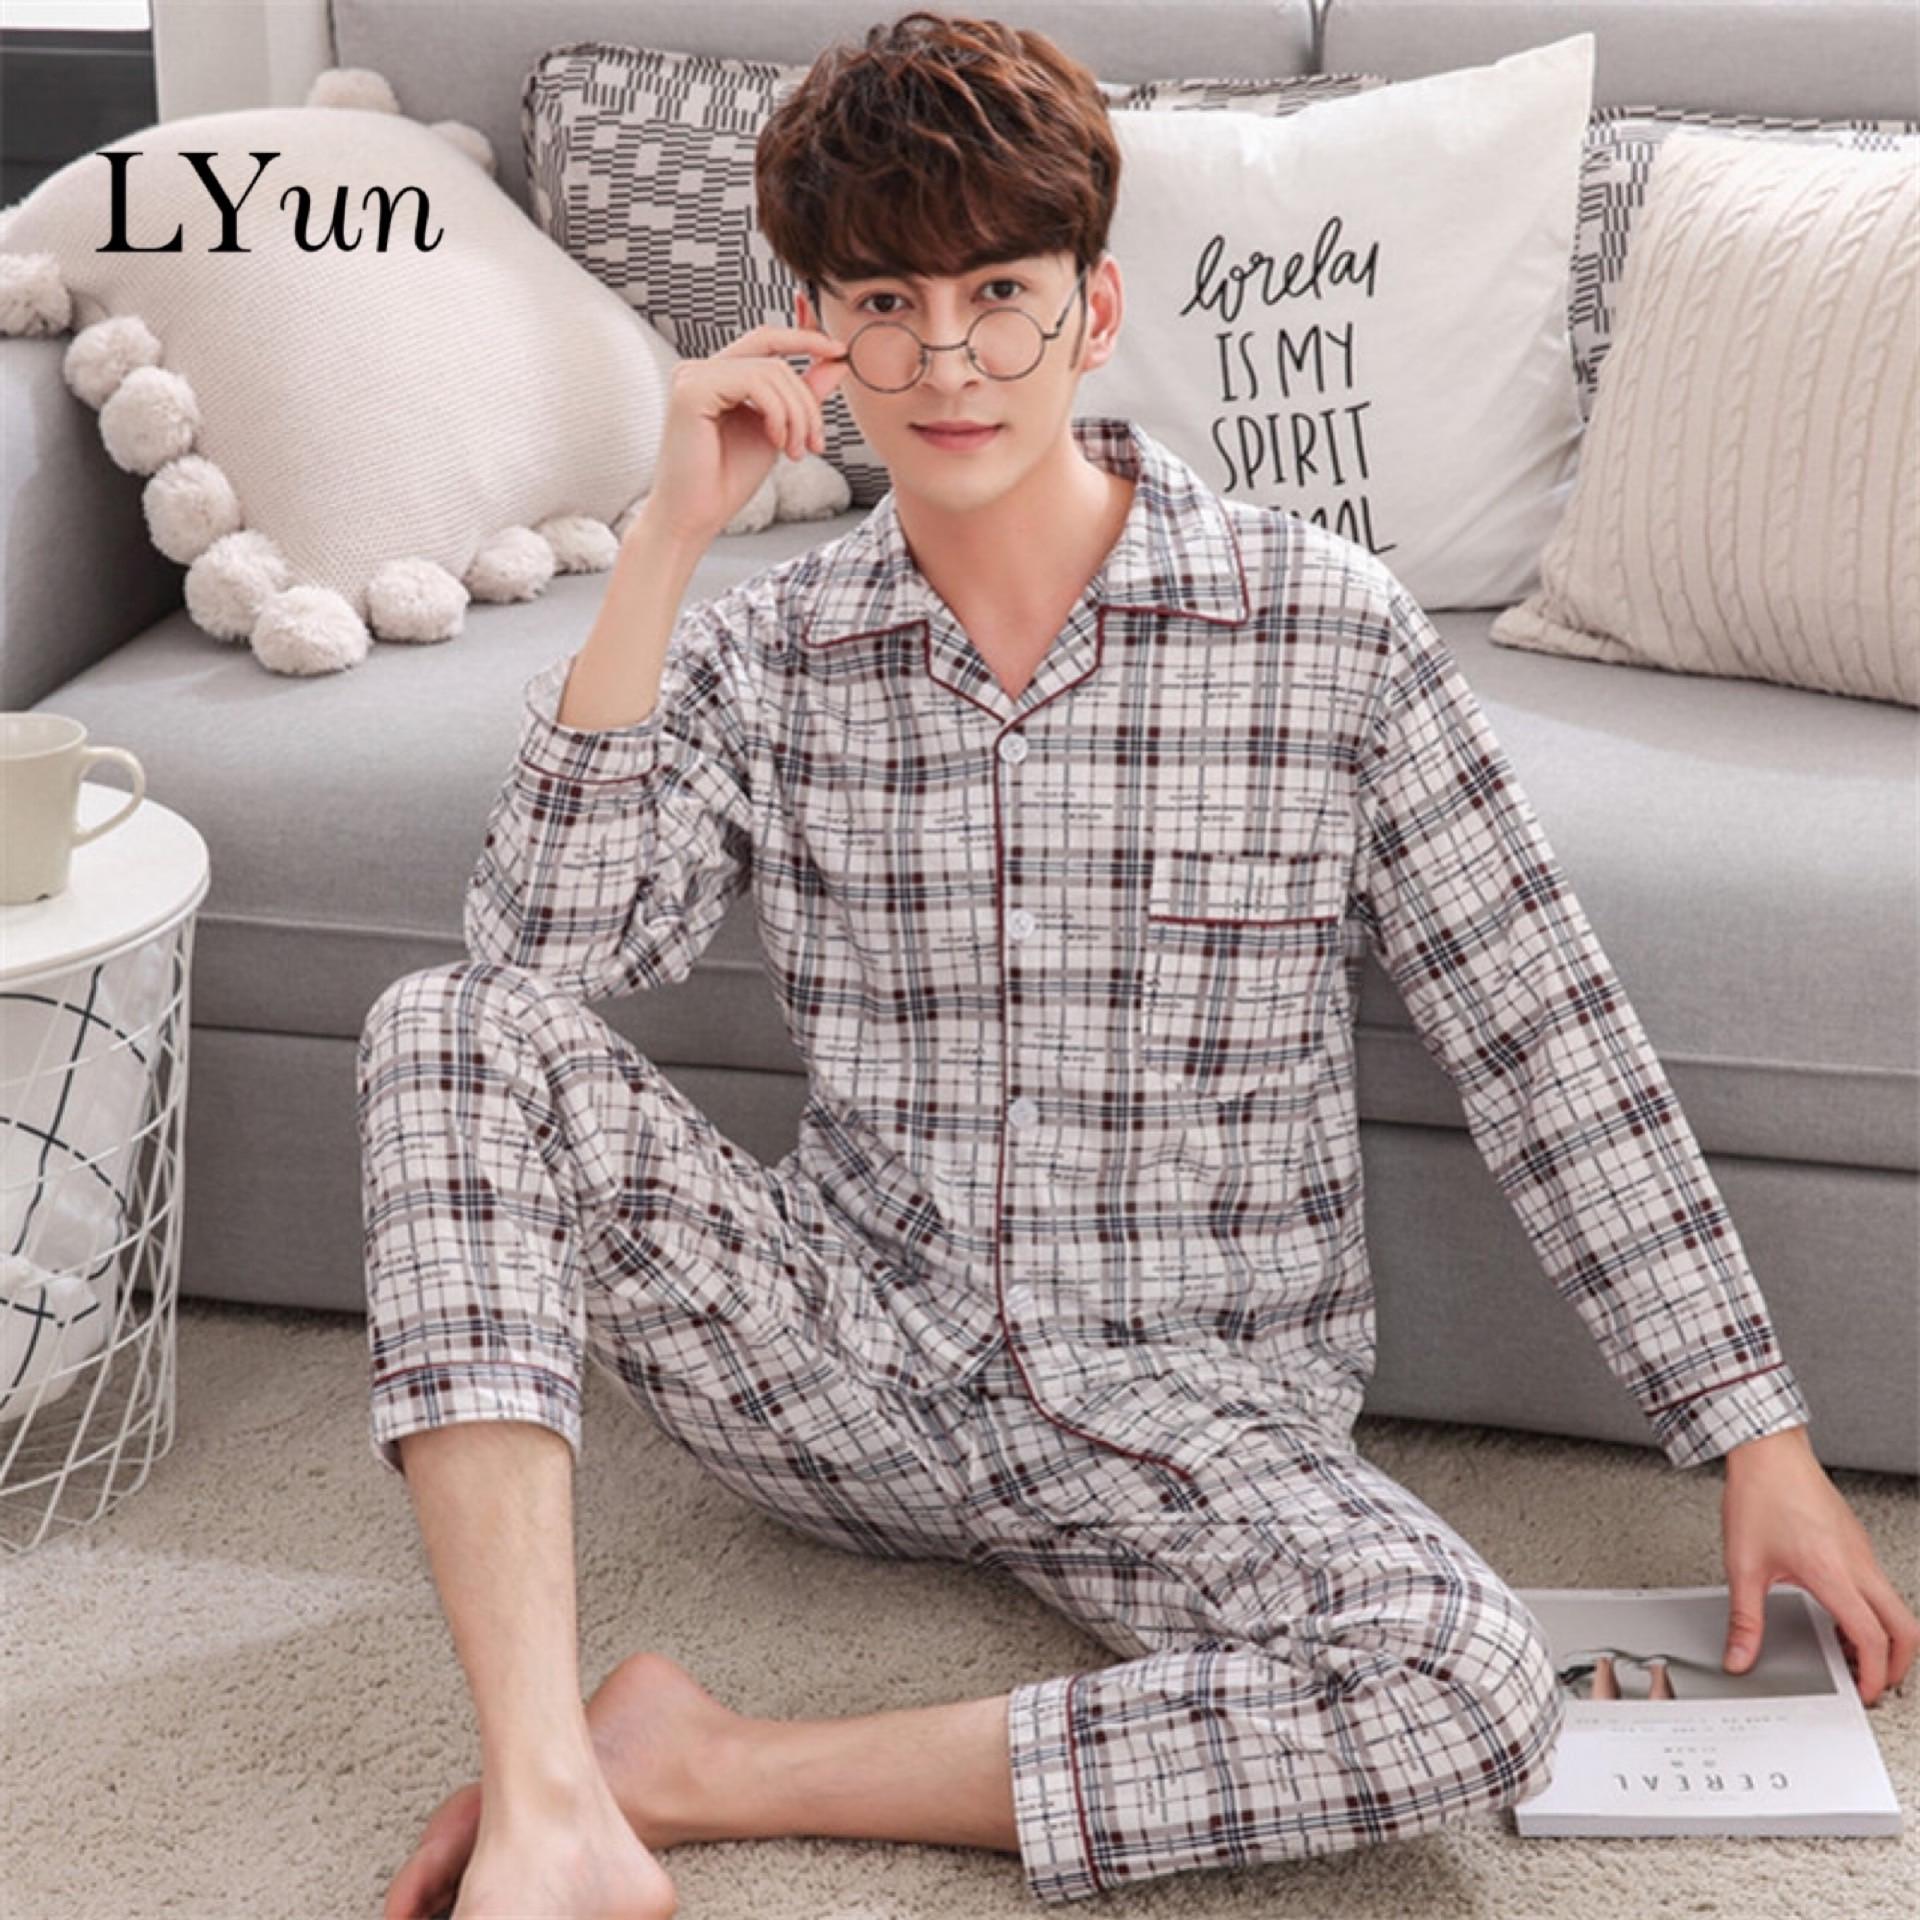 LYun Men's Pajamas Knitted Cotton Autumn Pajamas Men's Long-sleeved Trousers Pajamas Cardigan Men's Home Service